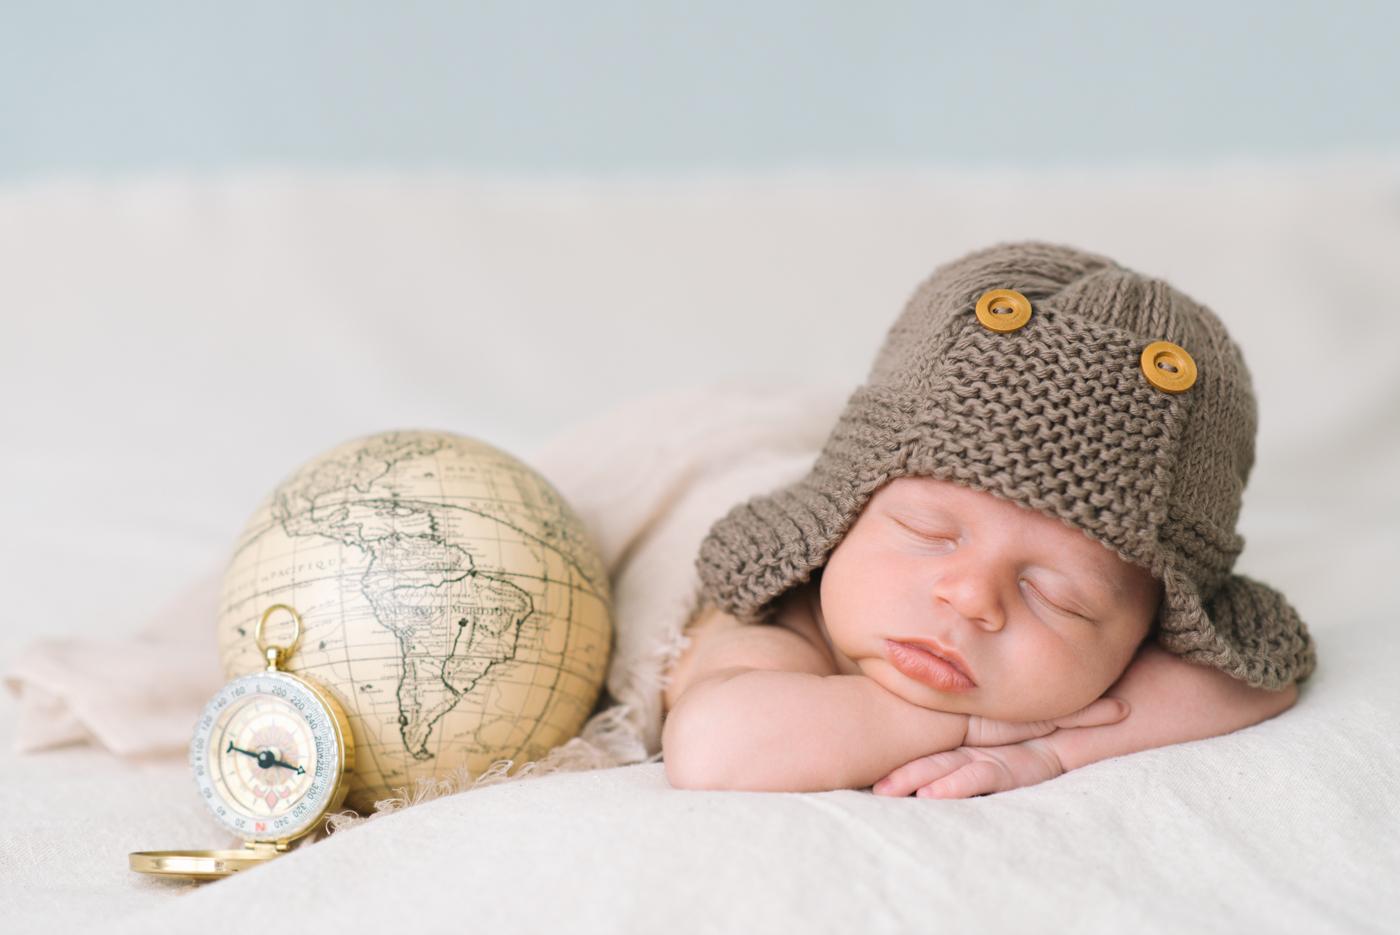 portland-oregon-newborn-photography-nautical-aviator-knit-hat-globe-compass-cute-baby-sleeping-shelley-marie-photo-1